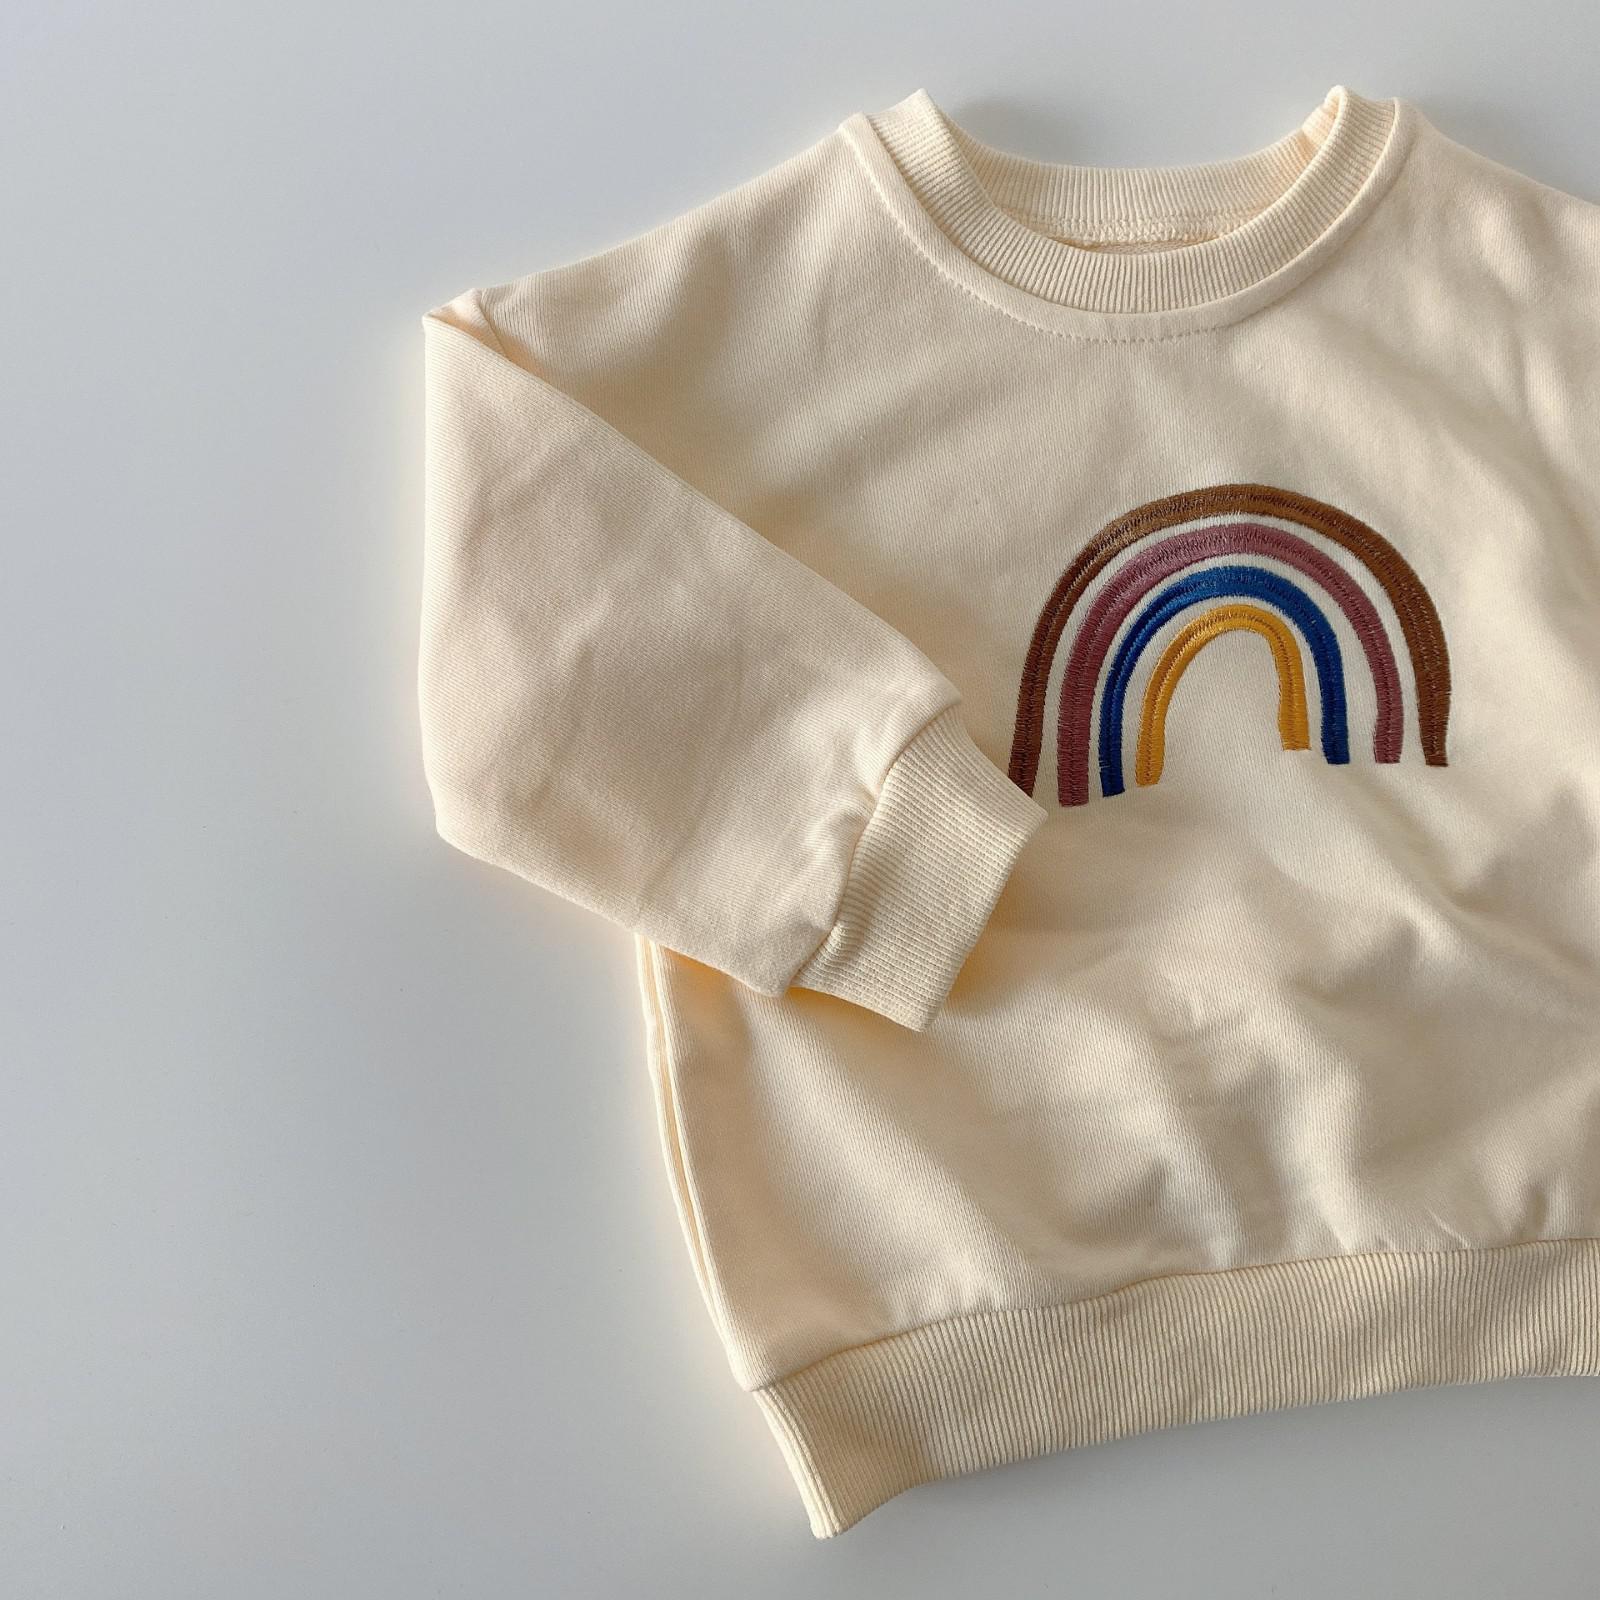 Autumn Baby Girls Embroidery Rainbow Sweatshirts Long Sleeve Tops Kids Toddler Boys Pullover Sweatshirt Rainbow T-shirt Clothes 10